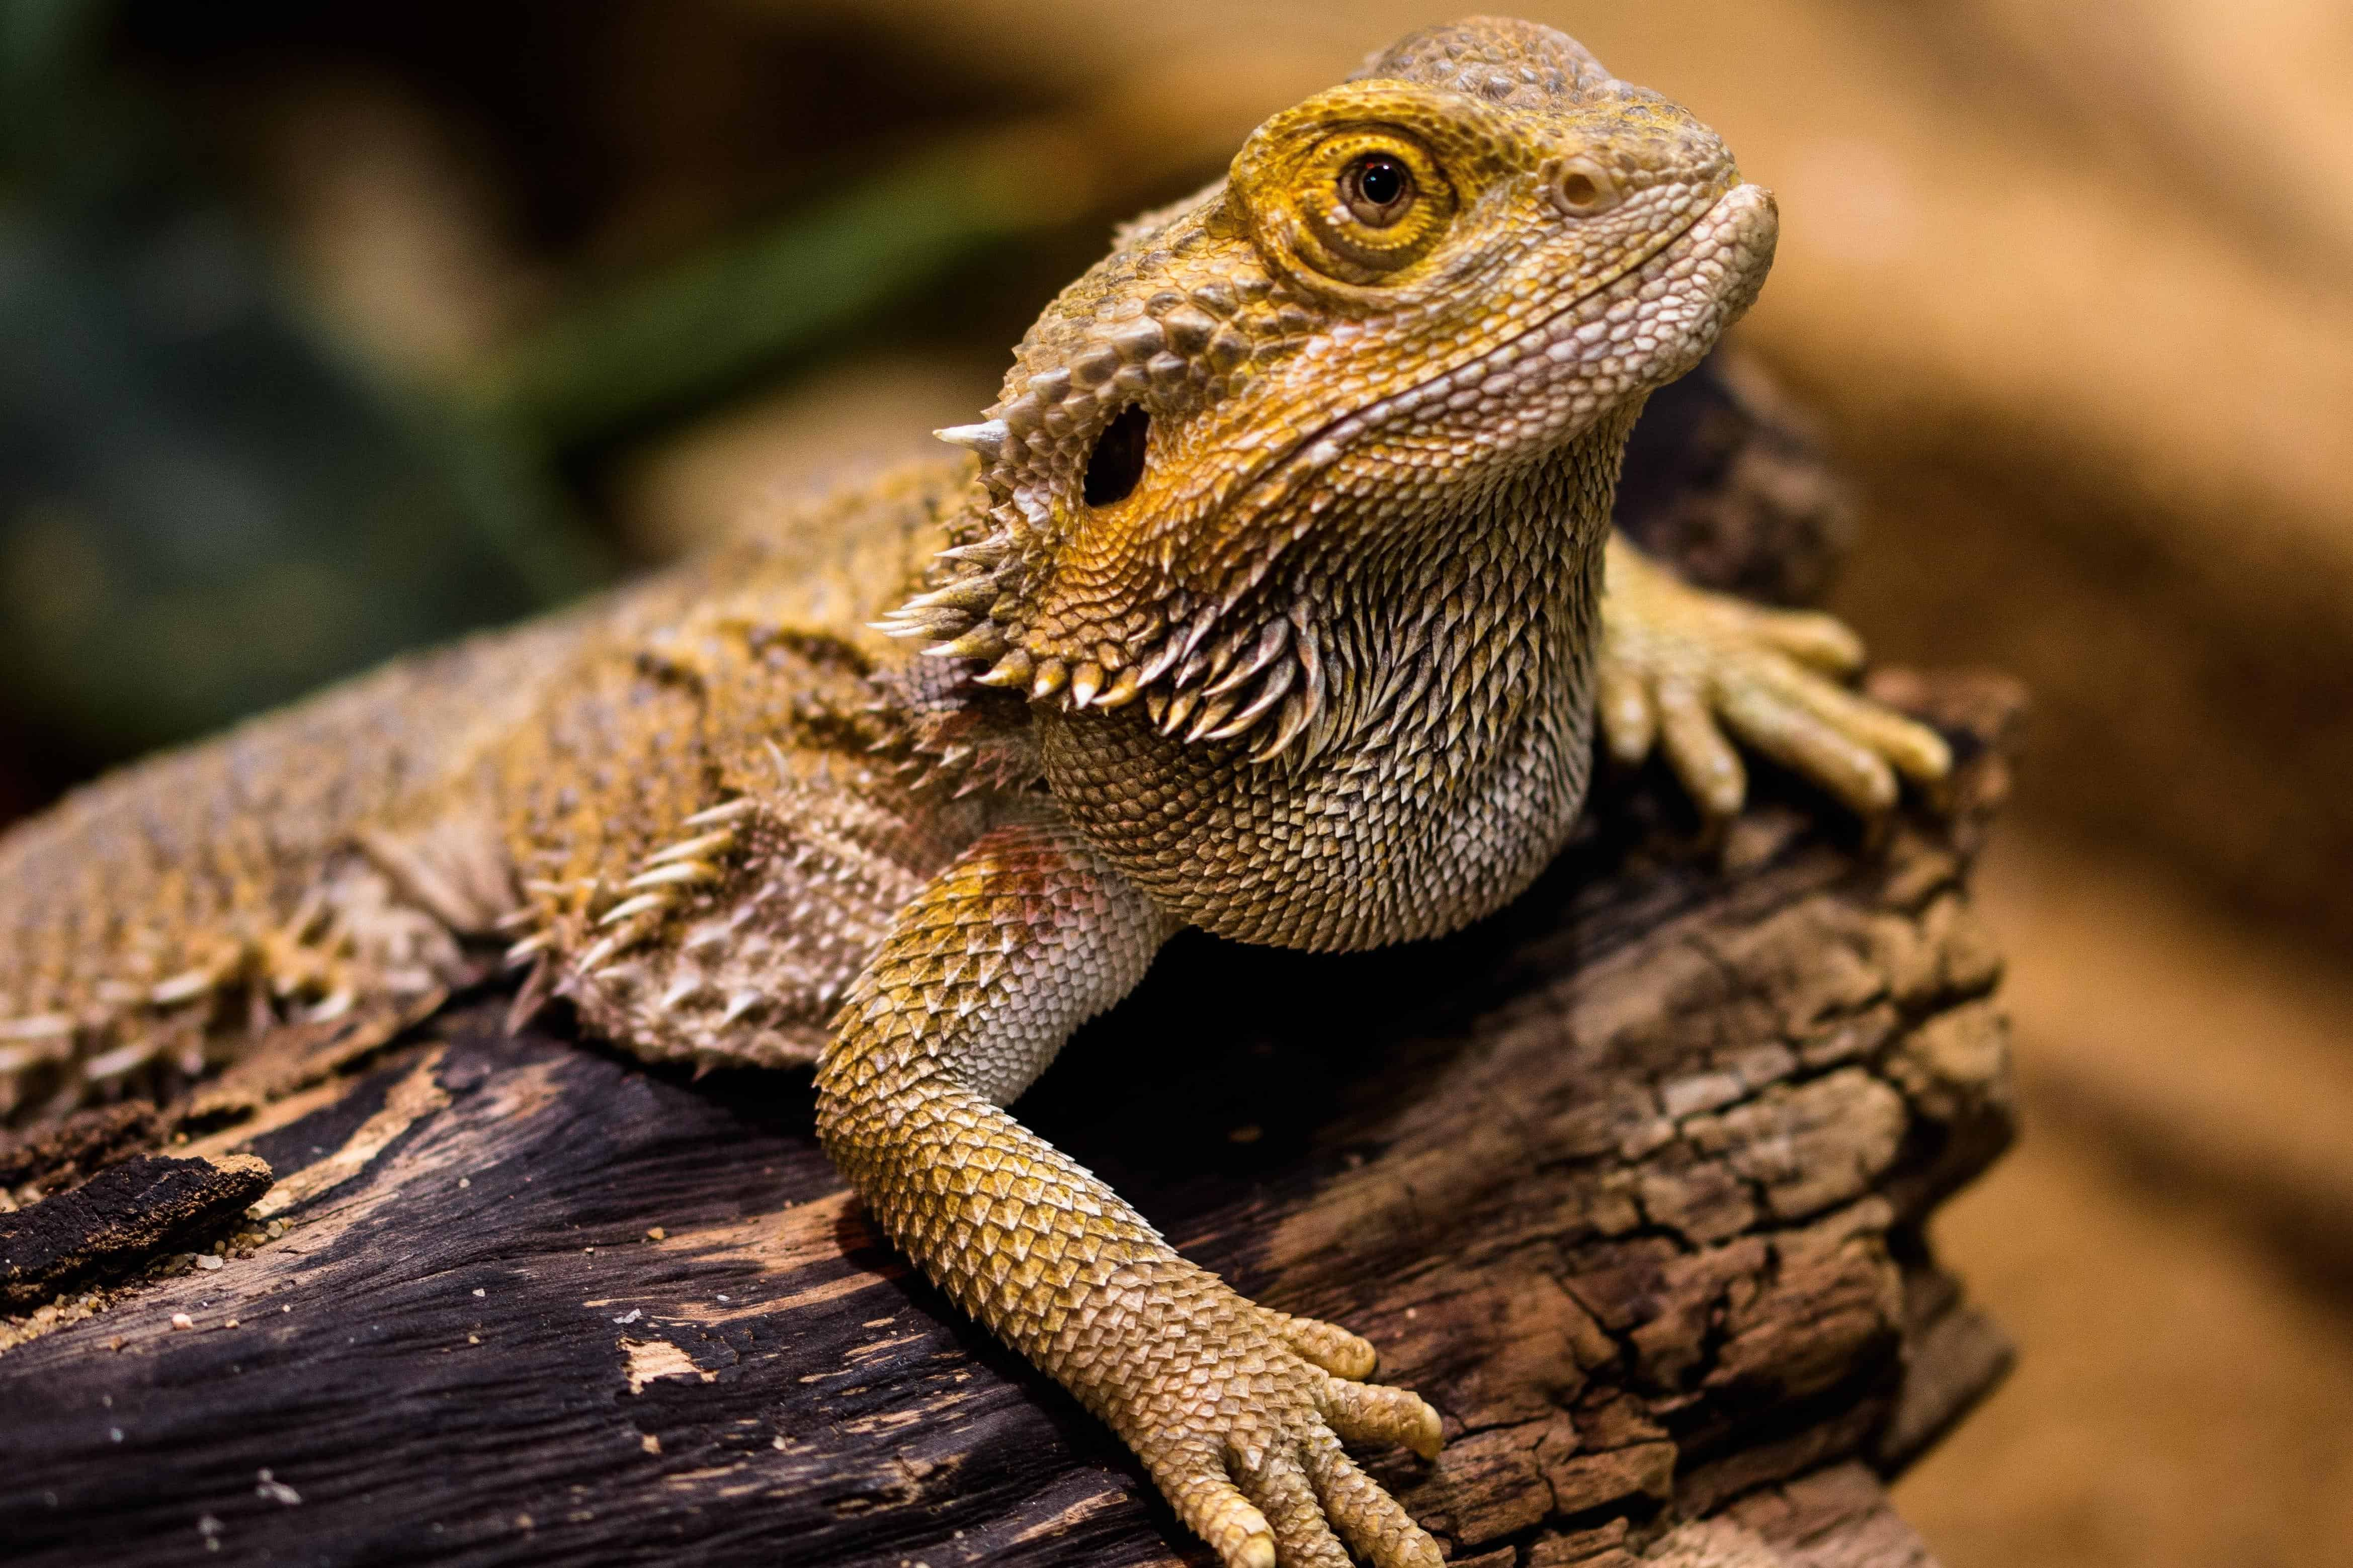 dragon reptile animal lizard iguana wild nature wildlife reptiles lizards fauna animals kb